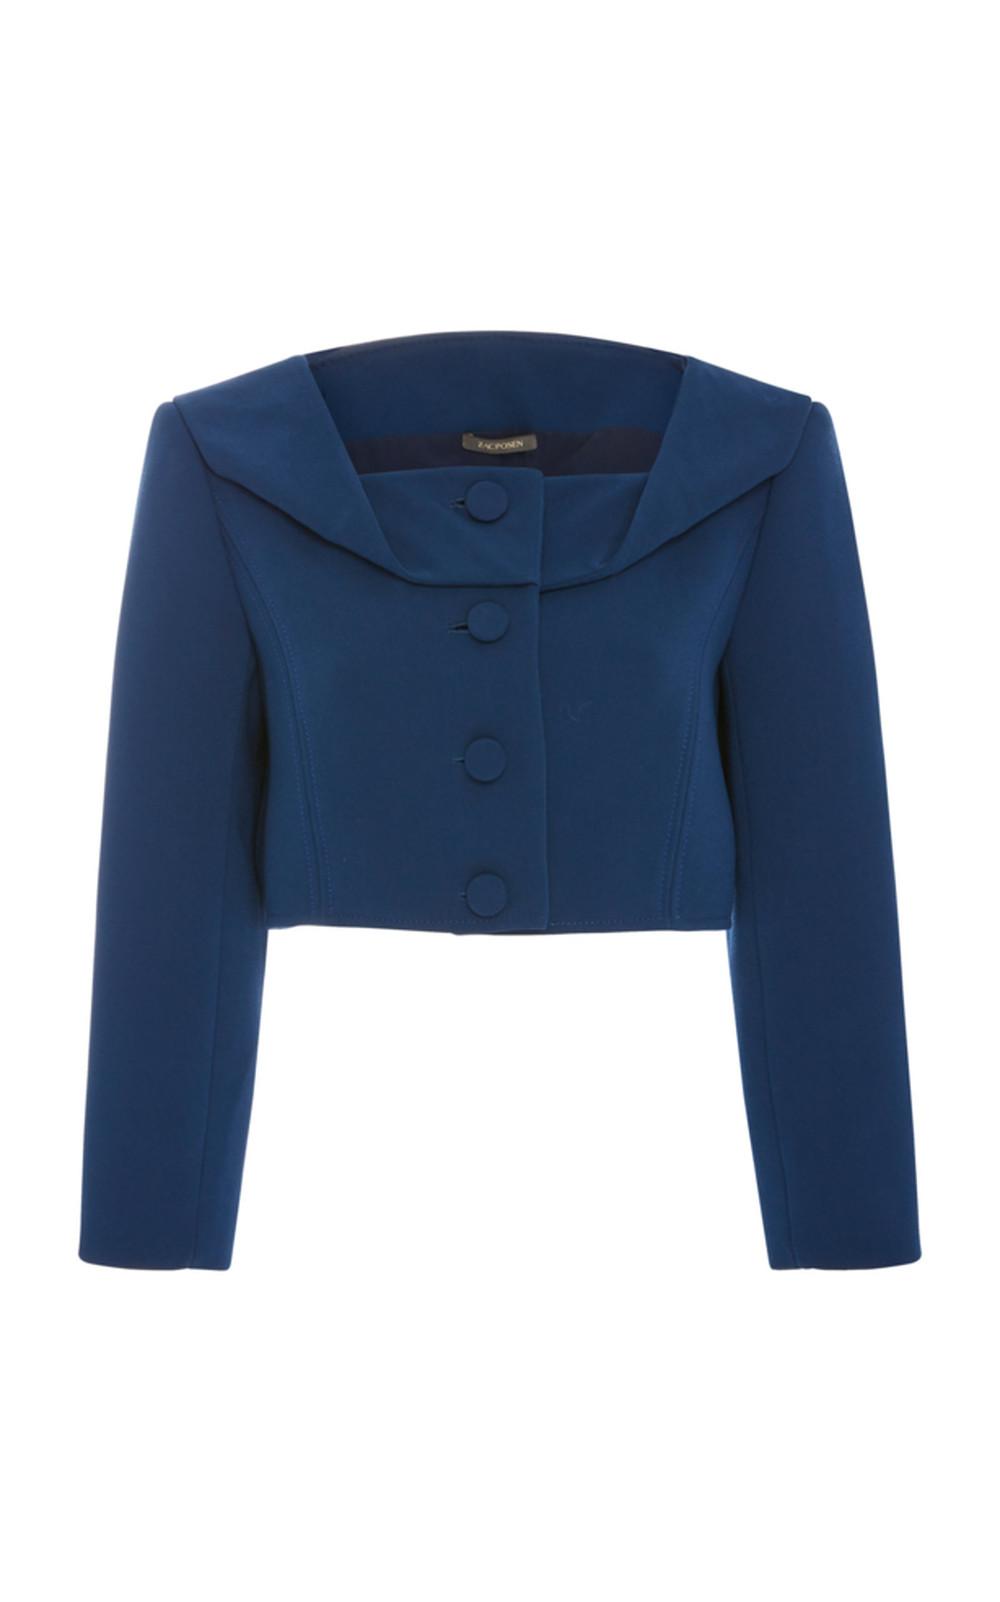 Zac Posen Crop Jacket in blue